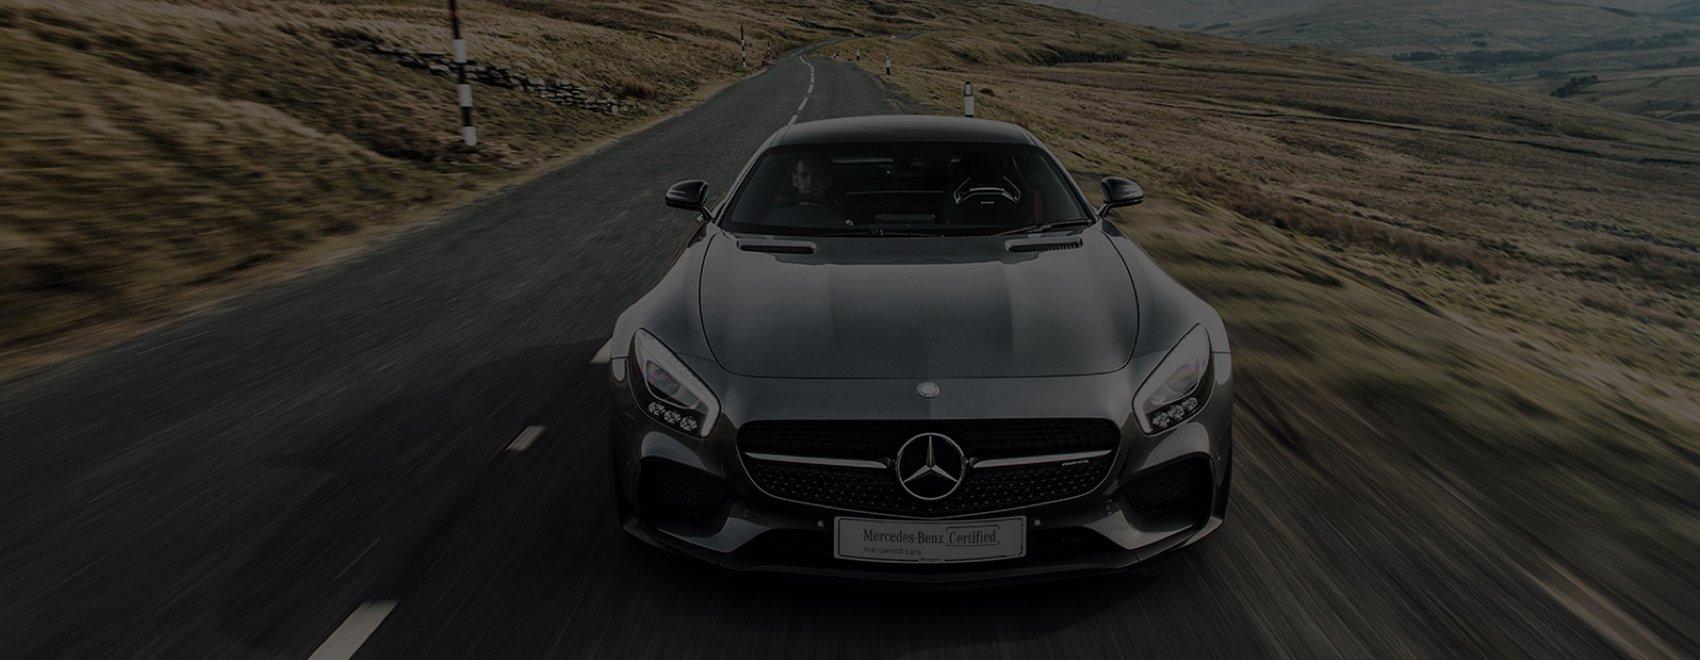 Brugte Mercedes-Benz<br>